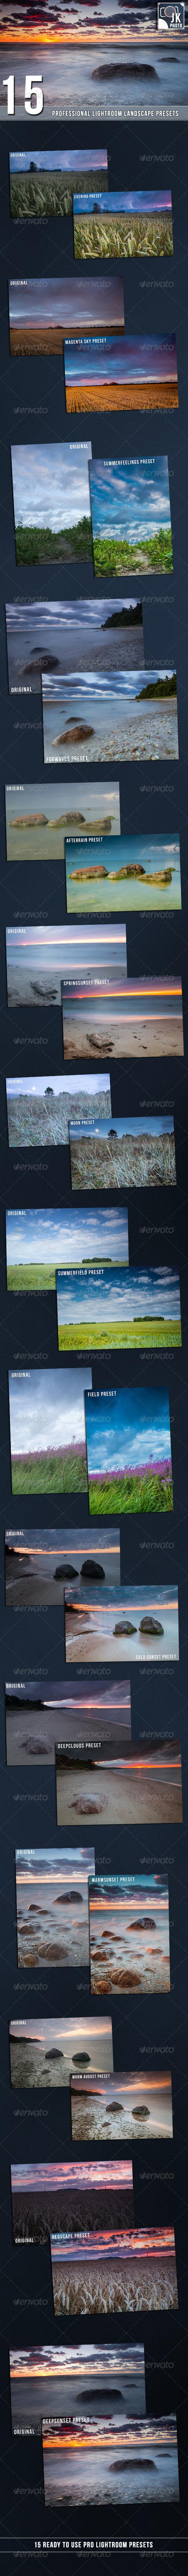 GraphicRiver 15 PRO Landscape and Nature Lightroom presets 7174086